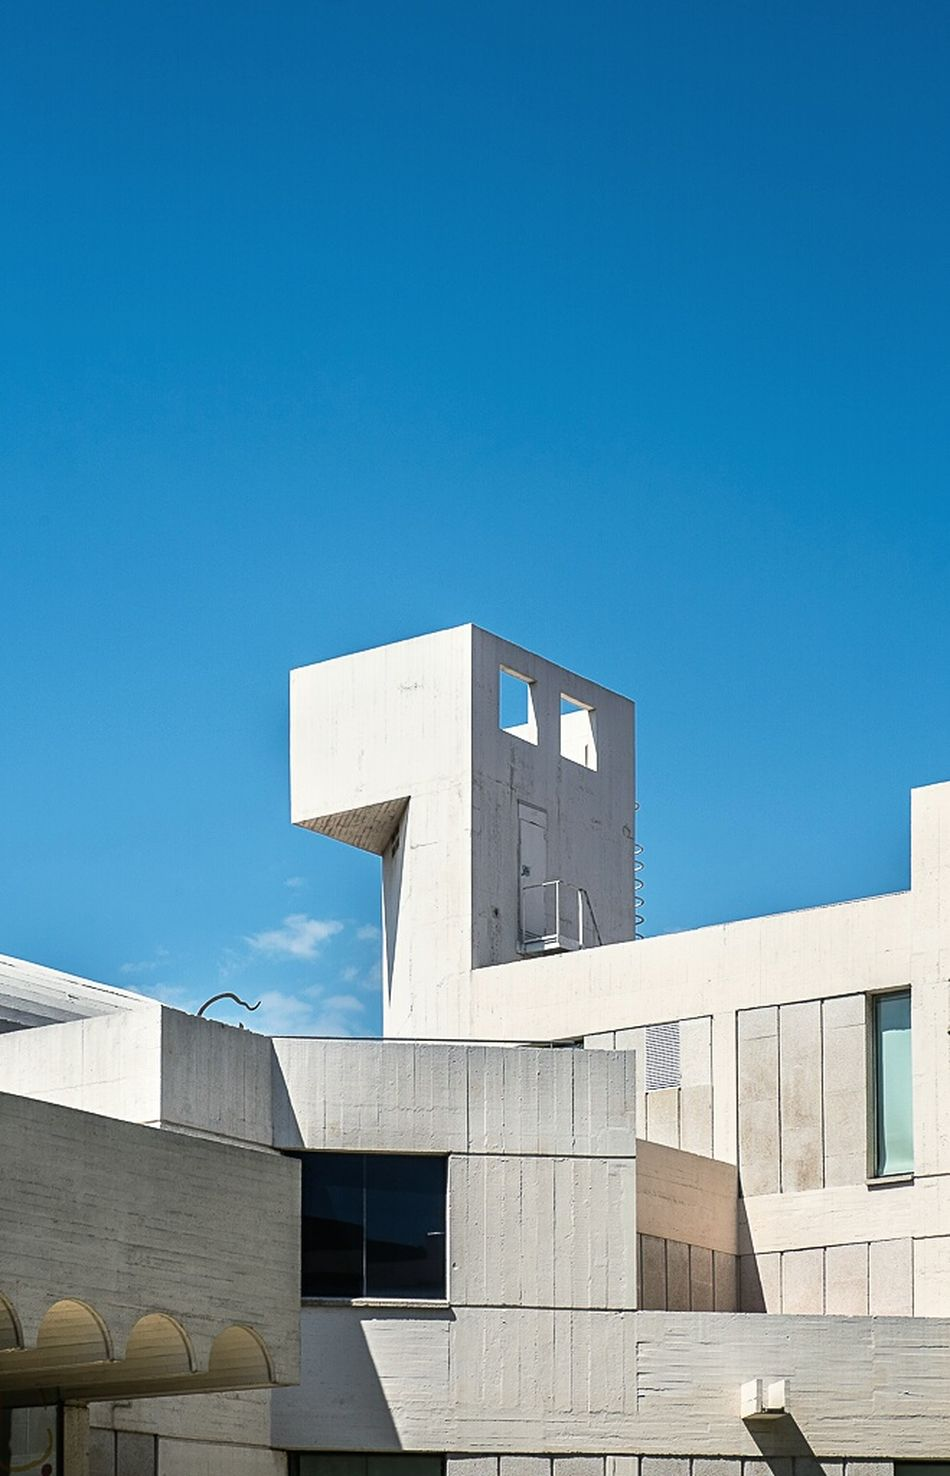 Fundació Joan Miró, by Josep Lluís Sert, 1975 Open Edit Amazing Architecture The Architect - 2015 EyeEm Awards Buildings Color